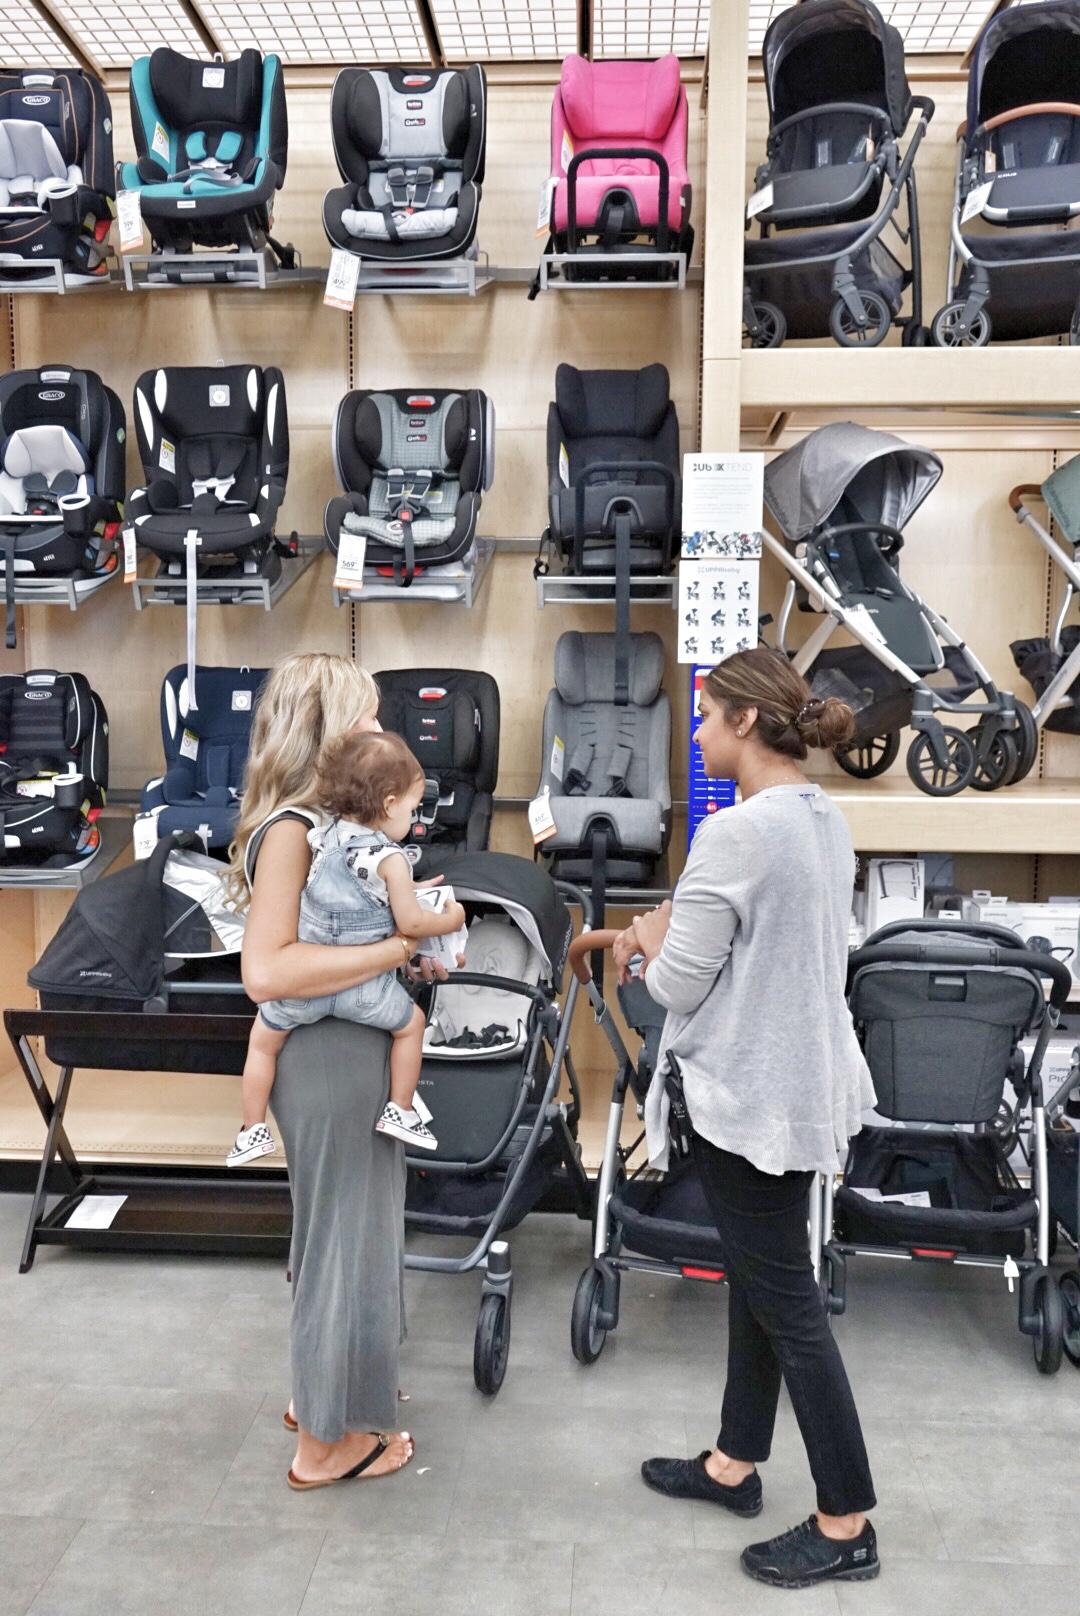 car seat shopping at buybuy Baby